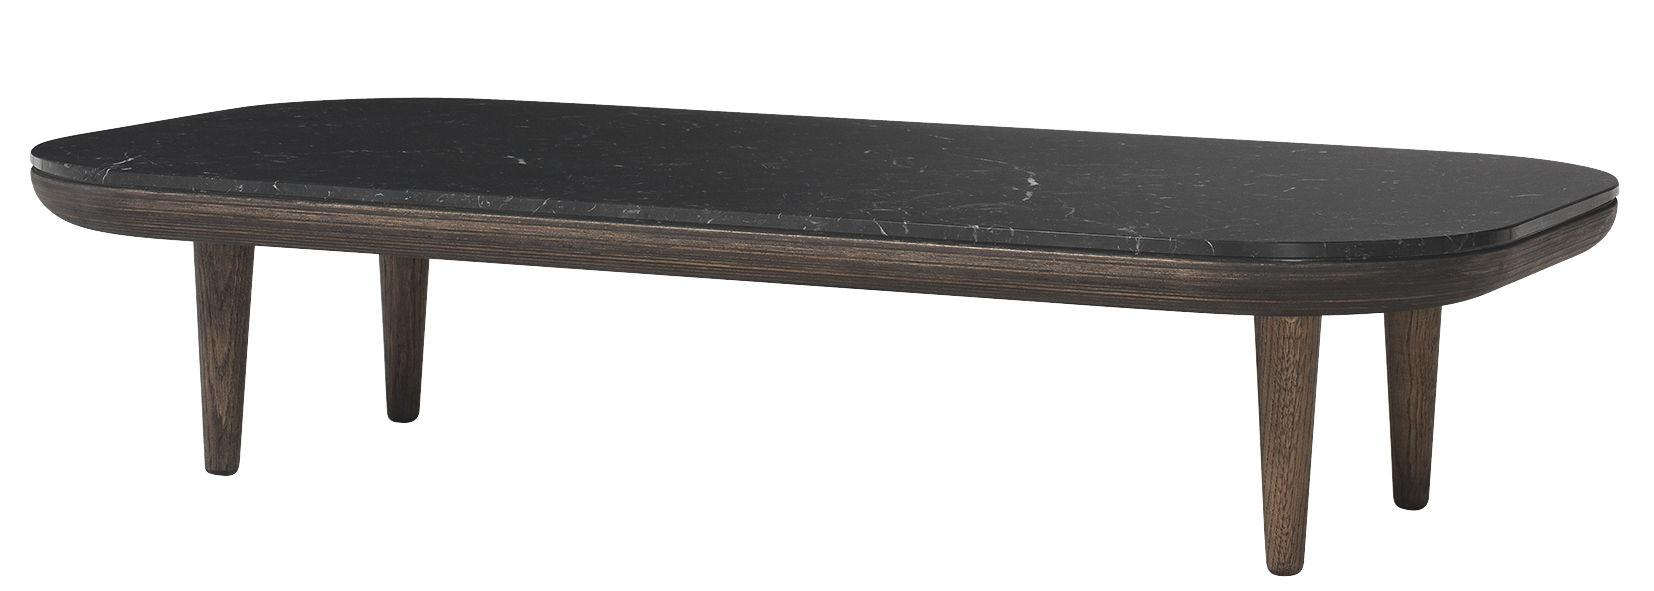 table basse fly marbre 120 x 60 cm ch ne fonc marbre noir tradition. Black Bedroom Furniture Sets. Home Design Ideas